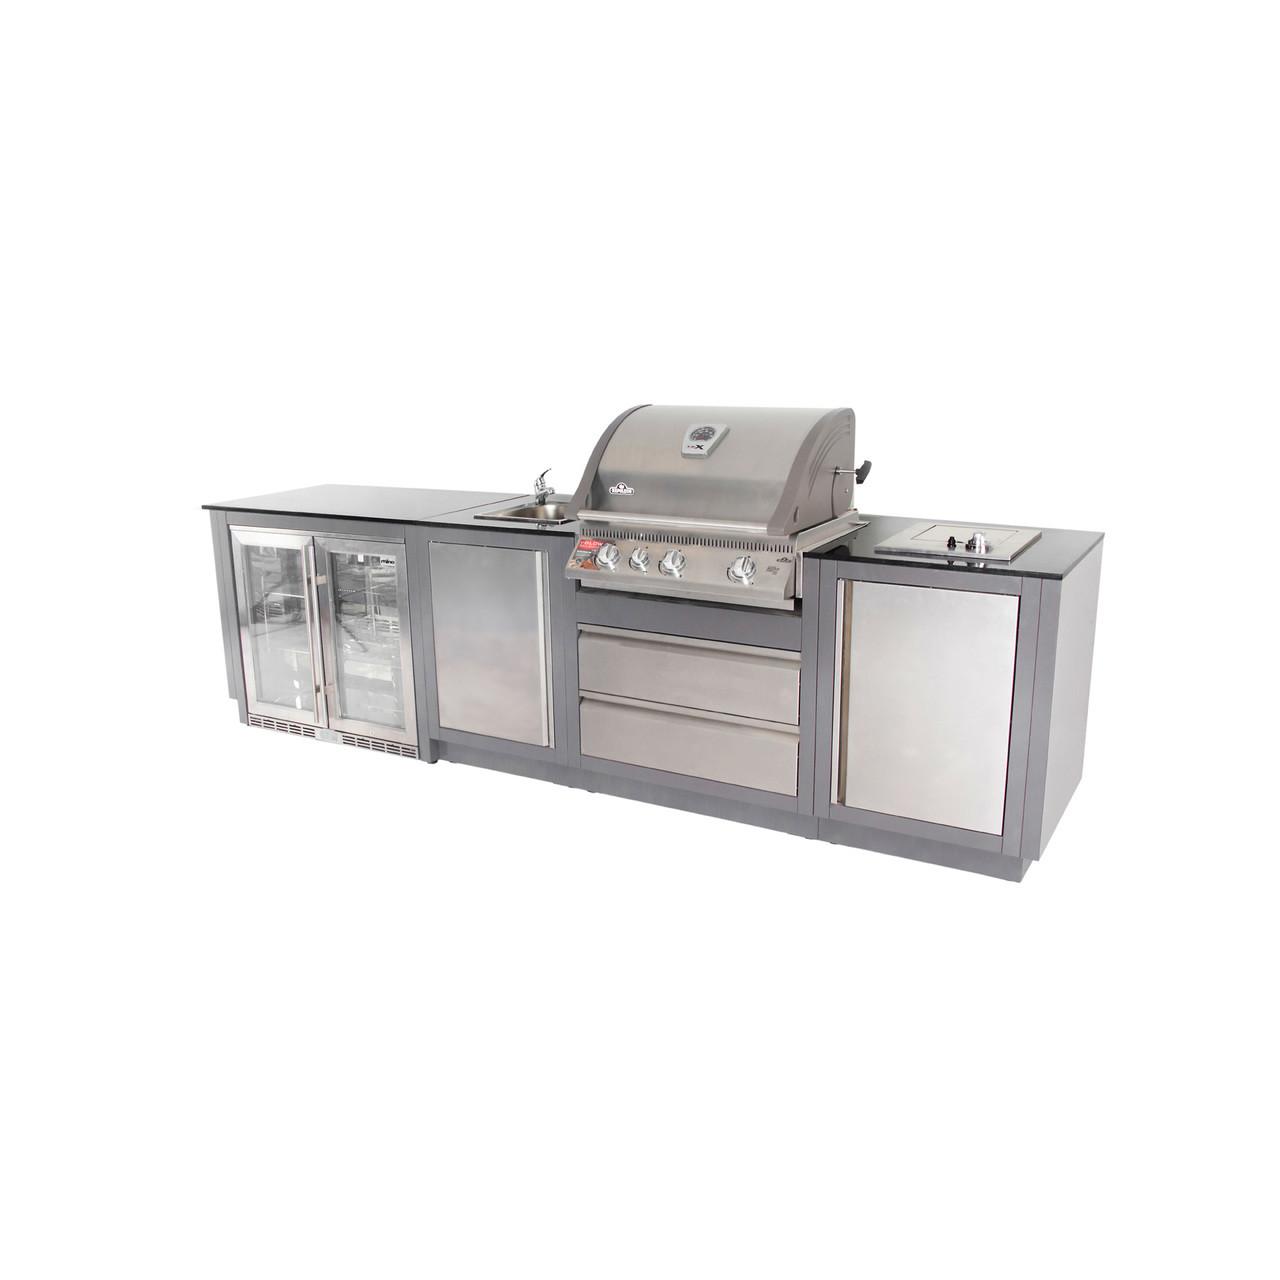 NAPOLEON 485 Double Fridge Straight Array Outdoor Kitchen - The BBQ ...